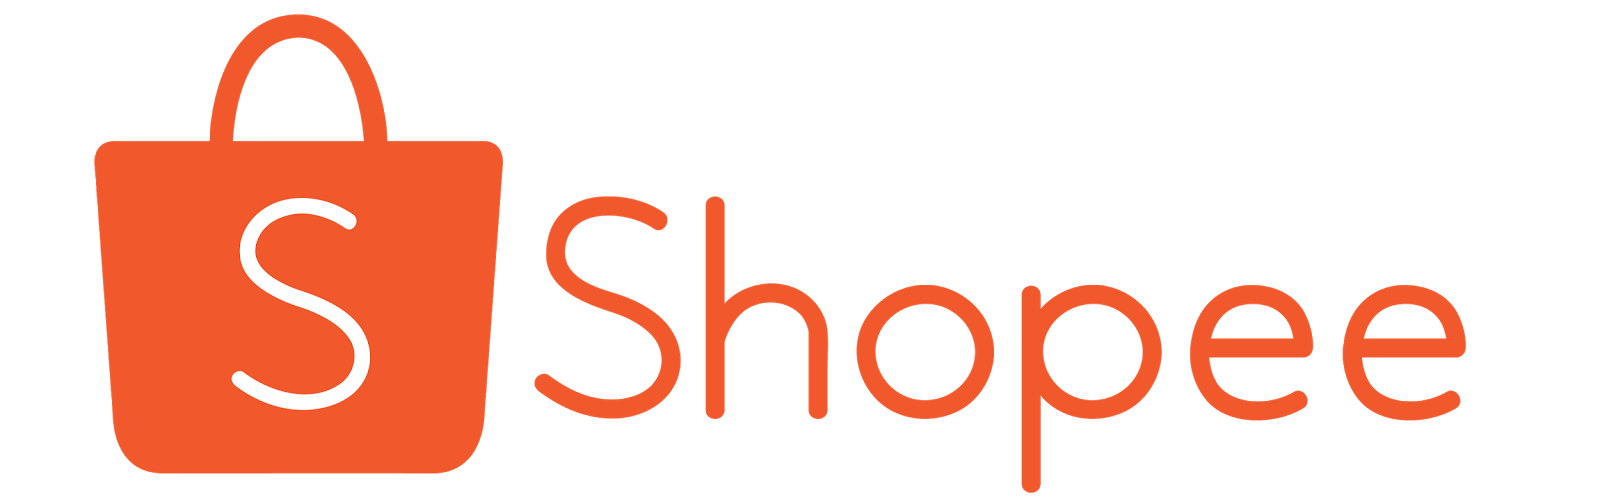 Shopee Free Ongkir